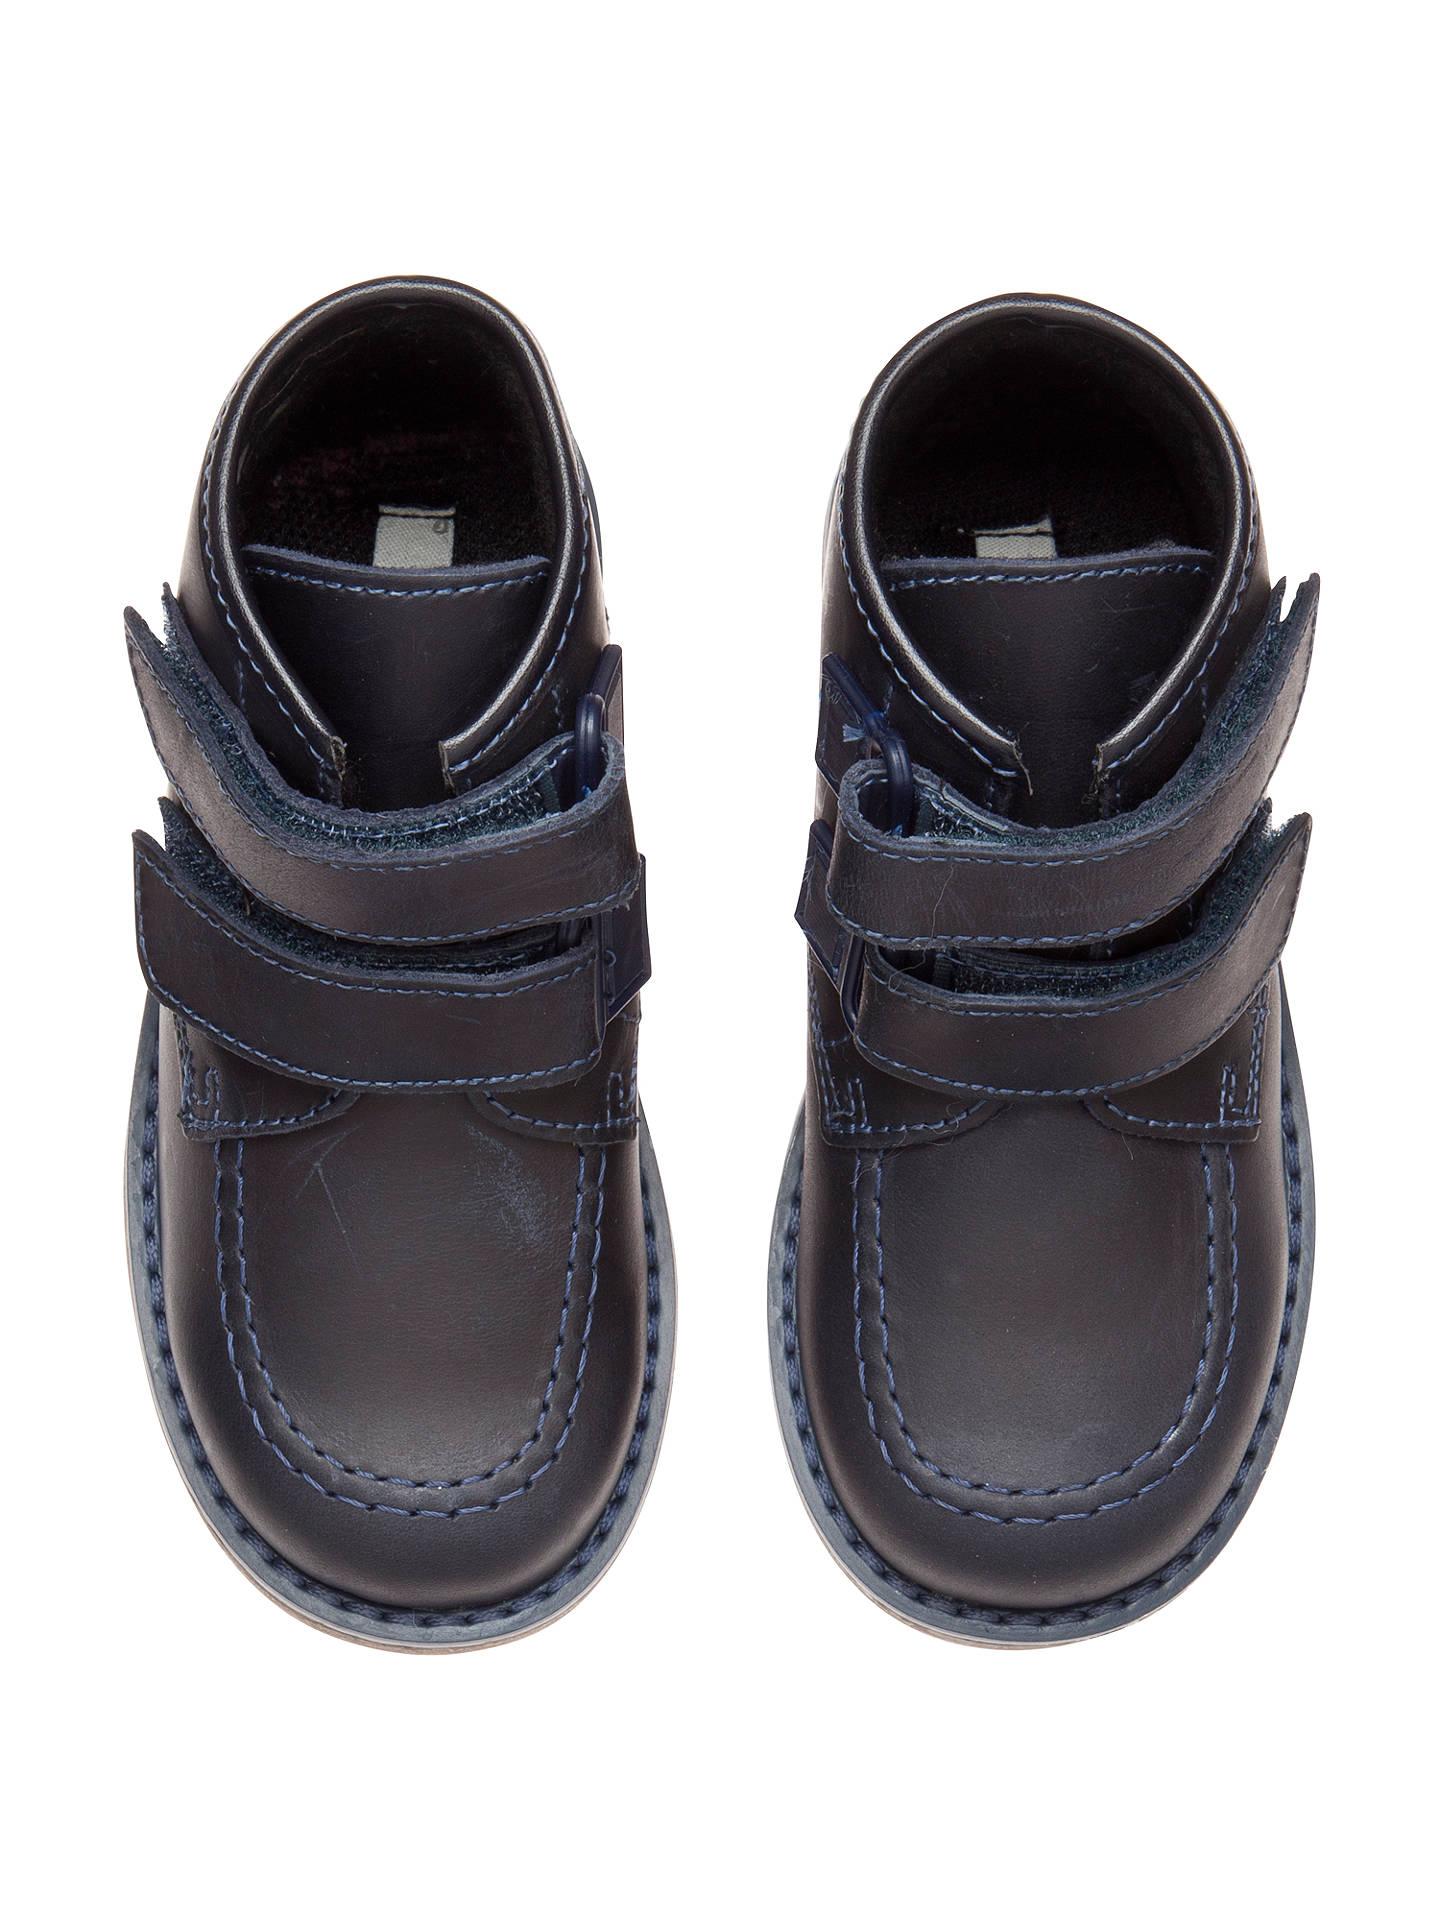 John Lewis Boy David Double Strap Boots, Navy at John ...